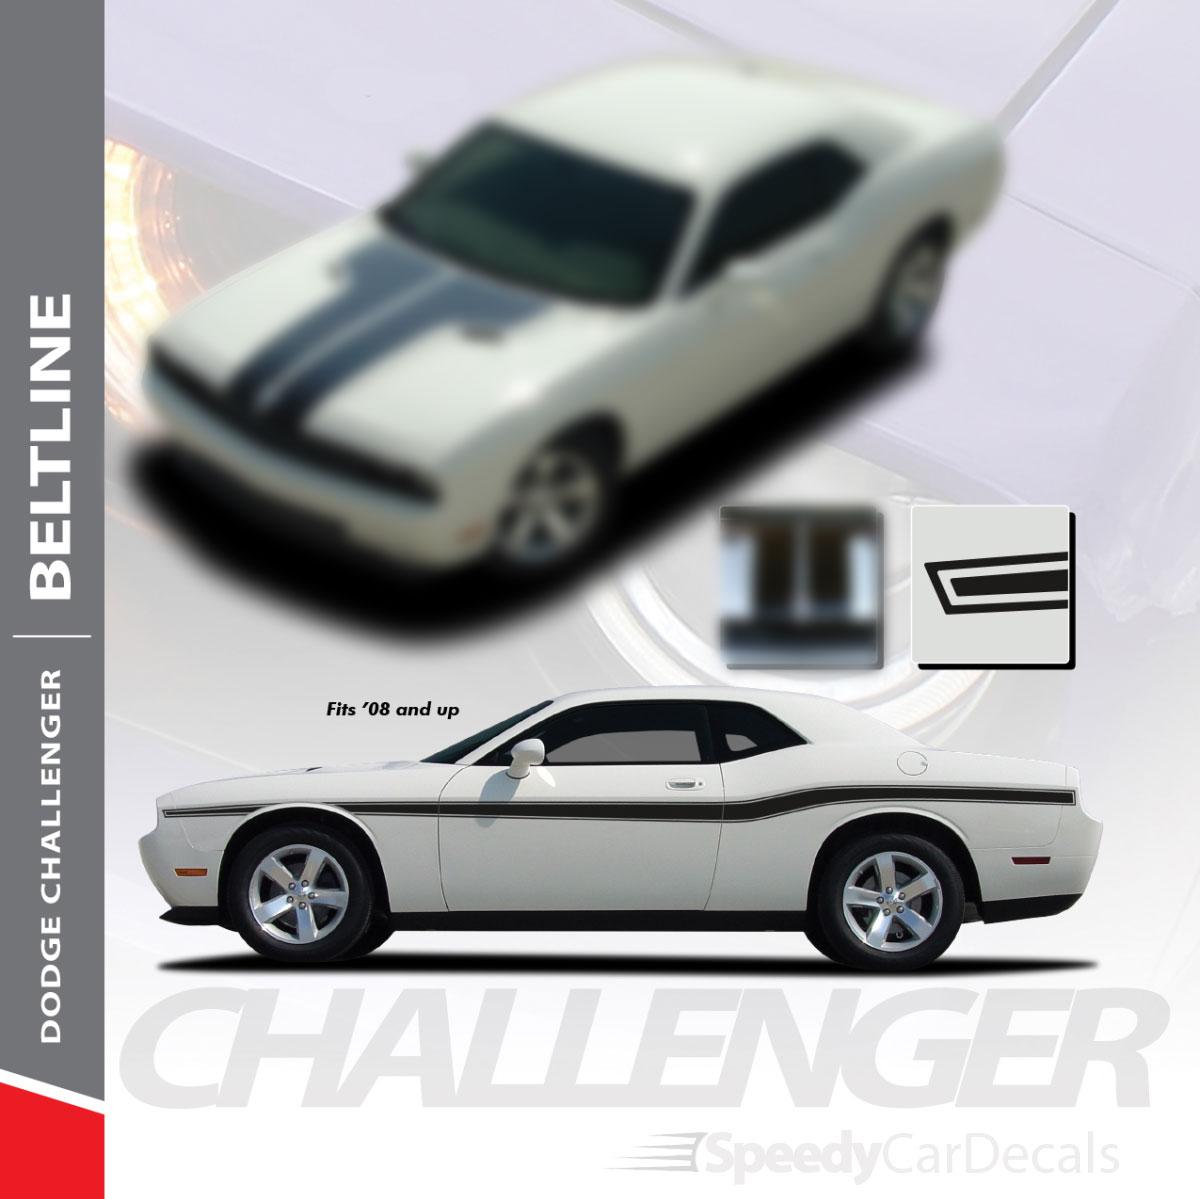 Dodge Challenger Body Line Stripe Kits 3m Beltline 2008 2021 Premium And Supreme Install Speedycardecals Fast Car Decals Auto Decals Auto Stripes Vehicle Specific Graphics